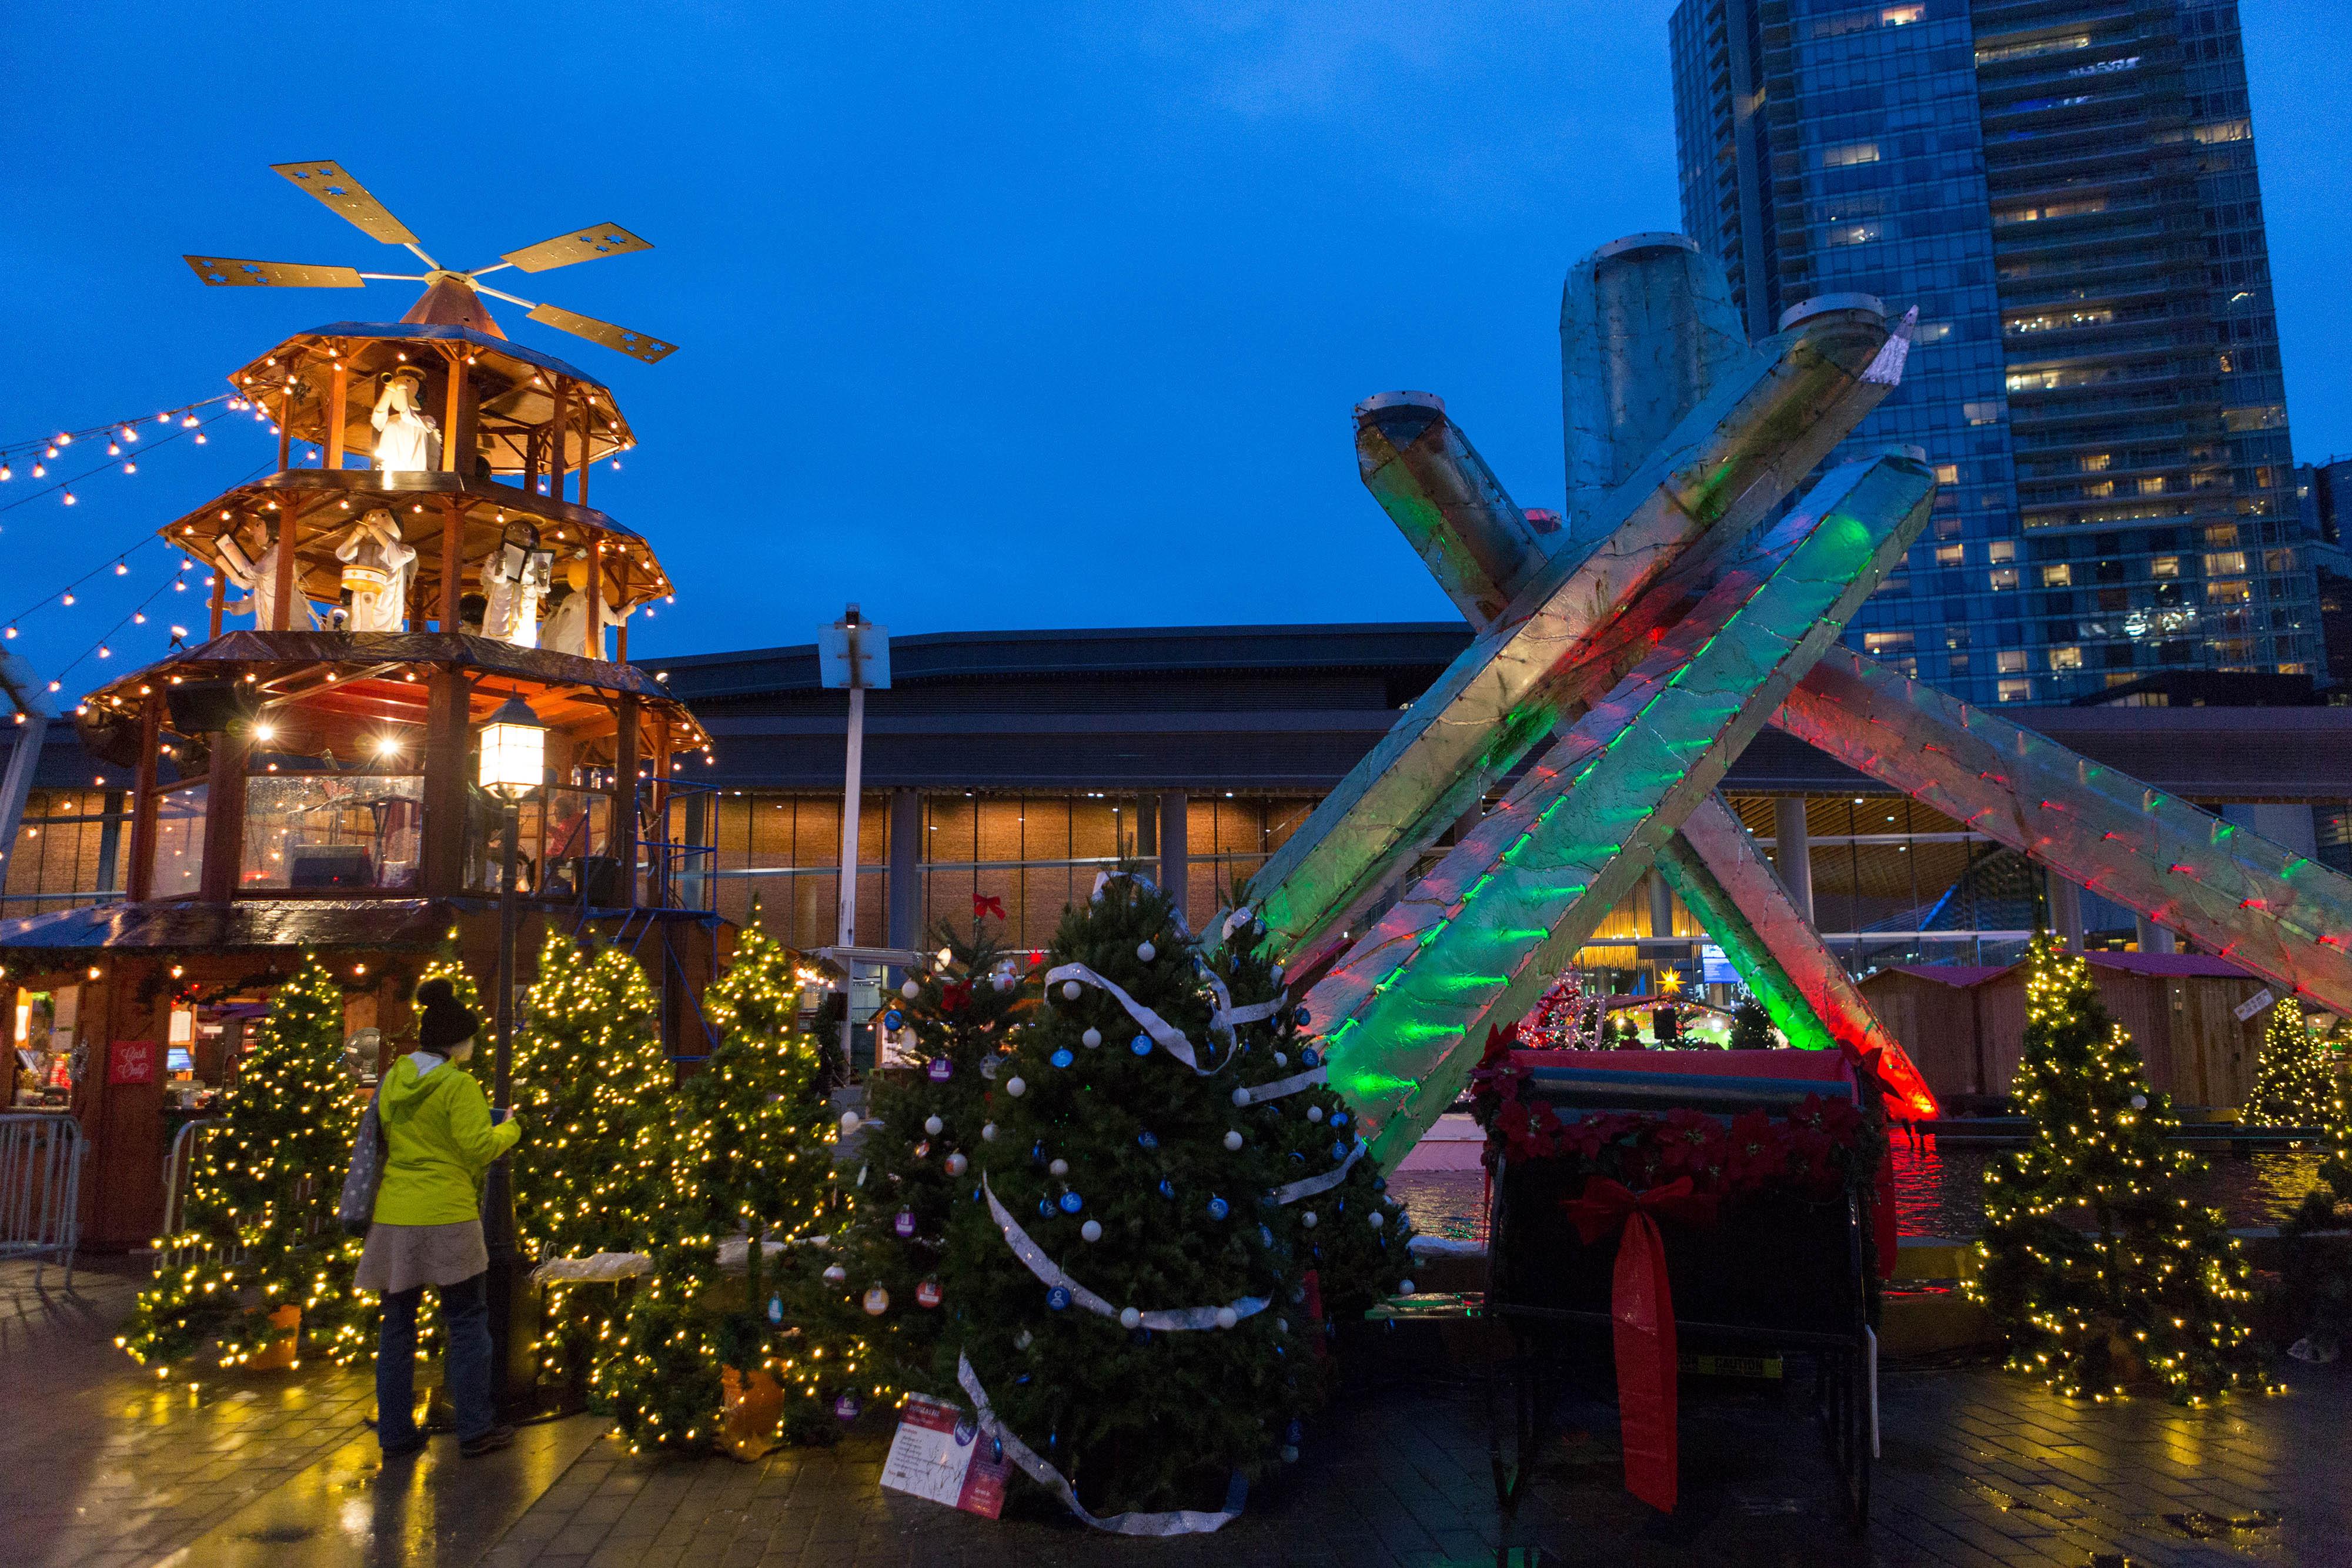 Vancouver Christmas Market.Photo Essay Vancouver Christmas Market Vancouver Homes